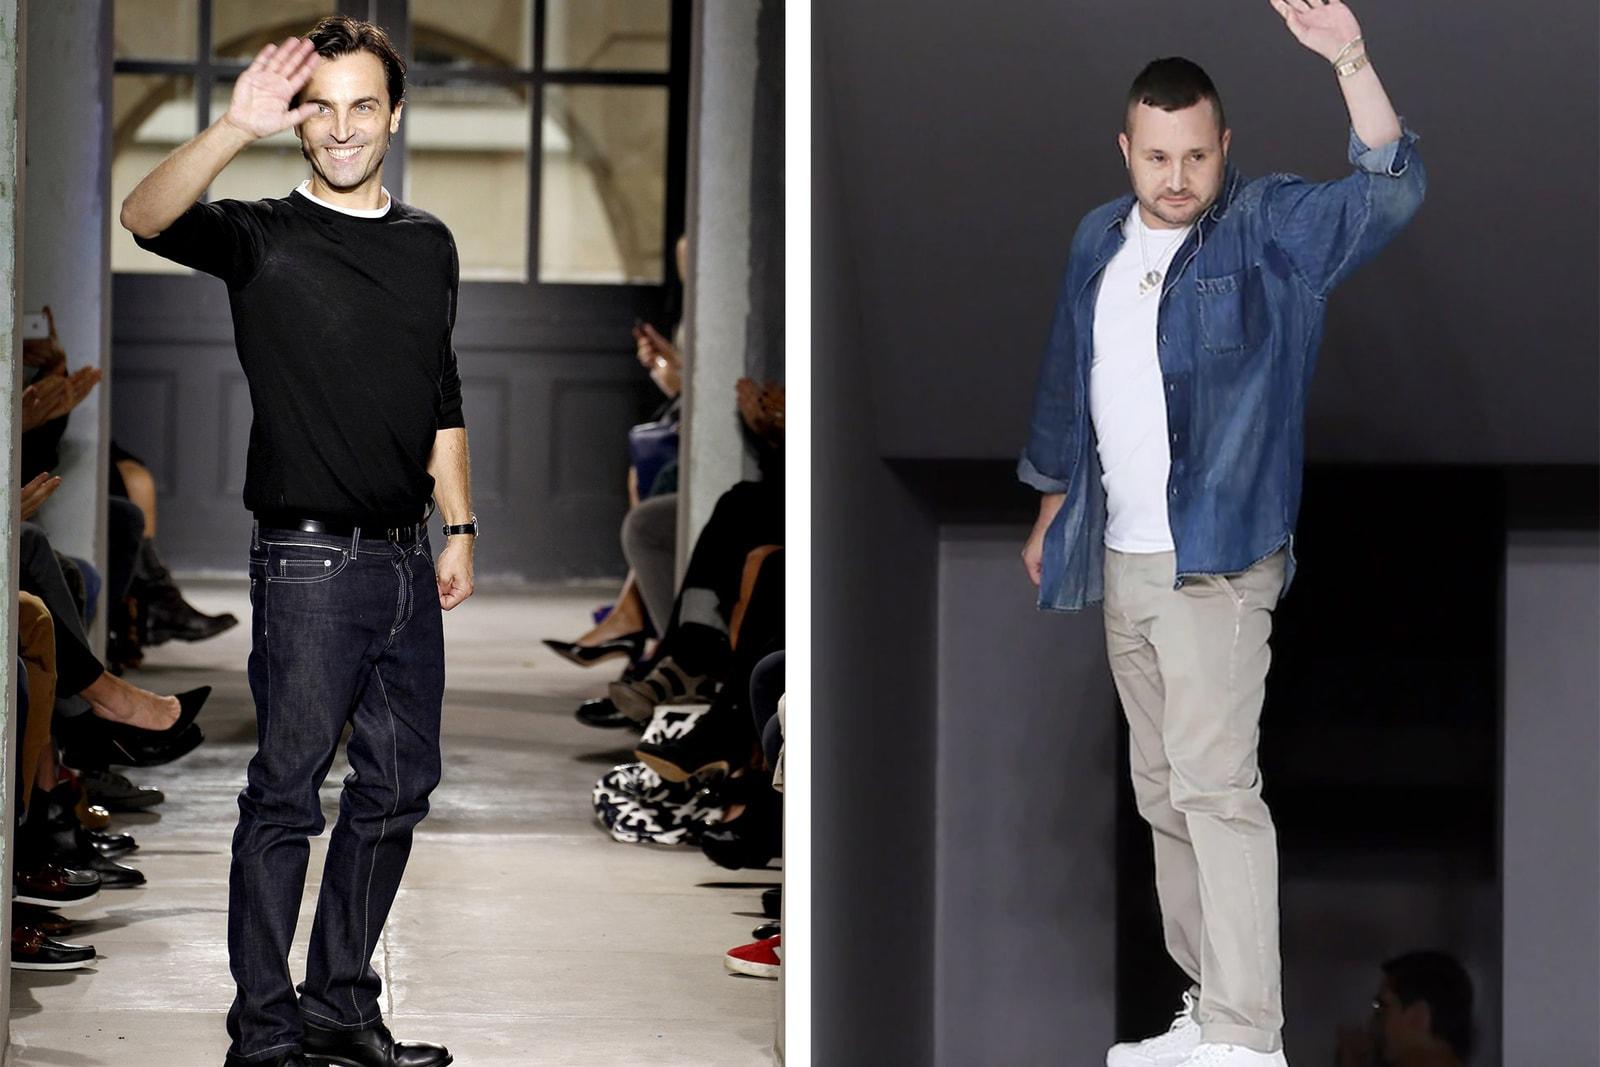 Fashion Breakdown Creative Directors Brands Gucci Louis Vuitton Balenciaga Chanel Prada Miu Miu Dior Burberry Brands Luxury Fashion Guide